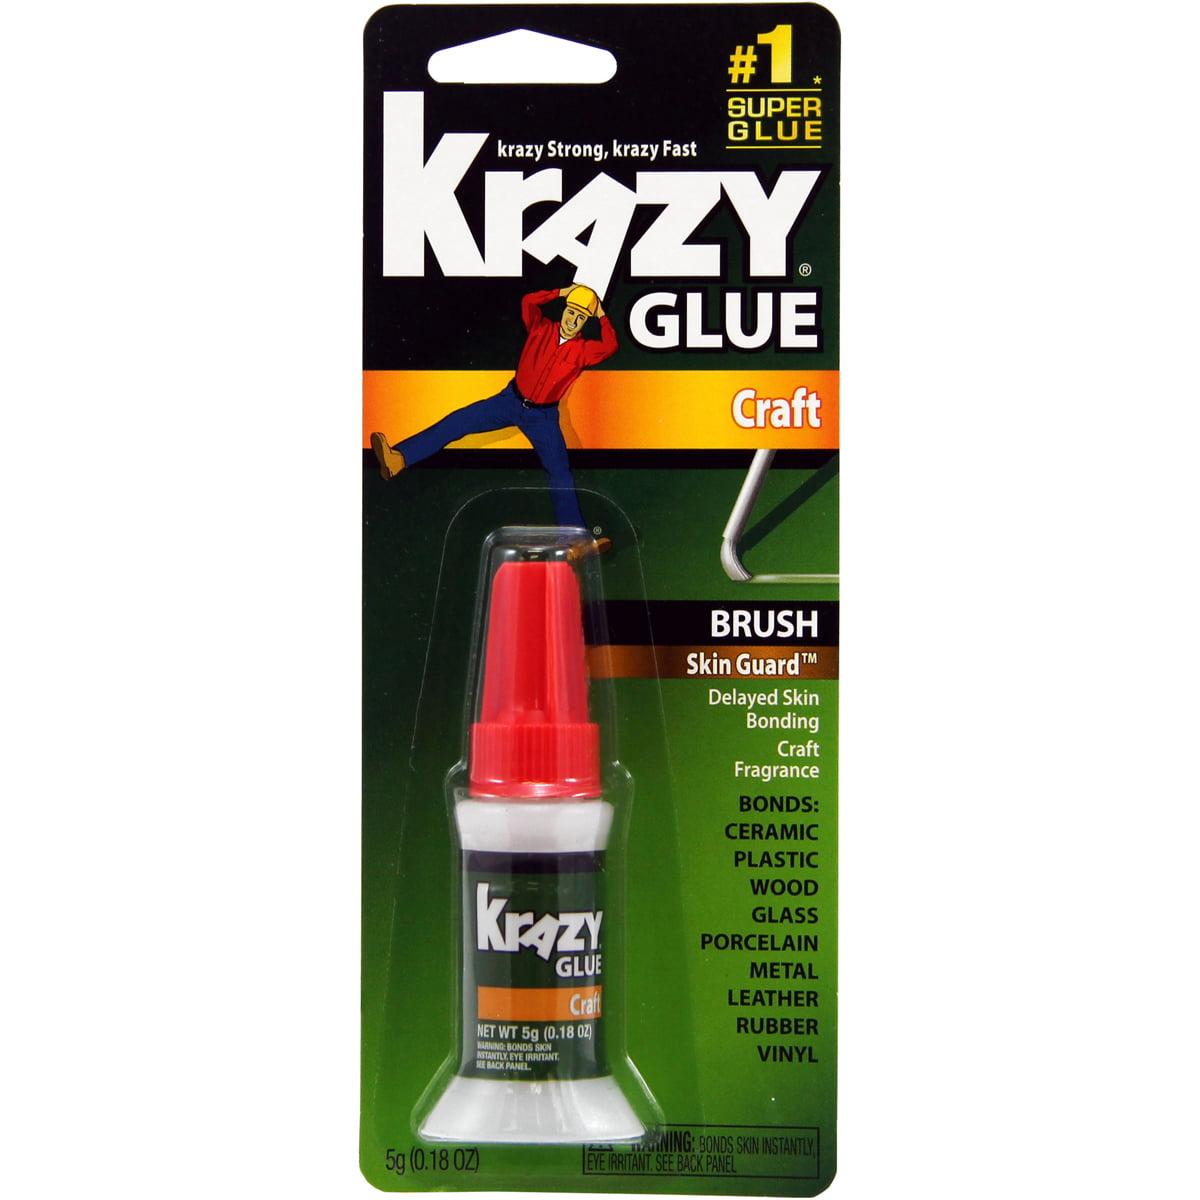 Krazy Glue Brush-On Craft Formula